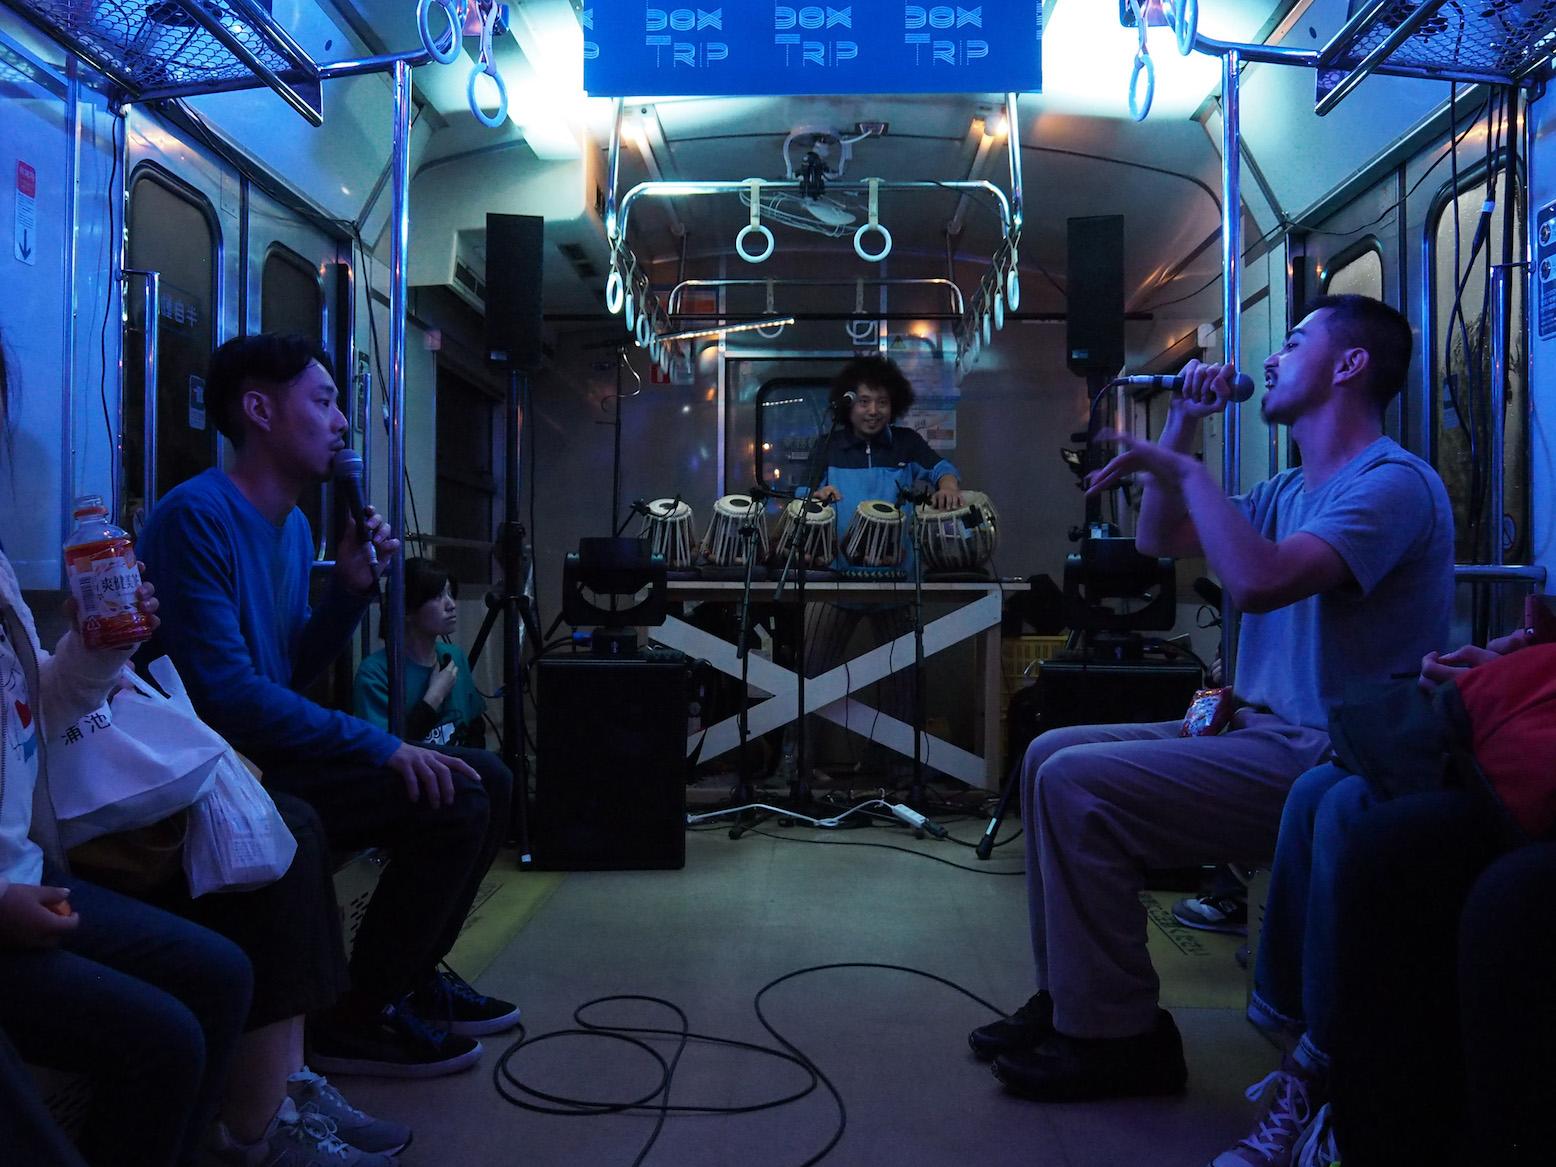 JR西日本・山口線車内で行われたライブ・パフォーマンス『Boombox TRIP』